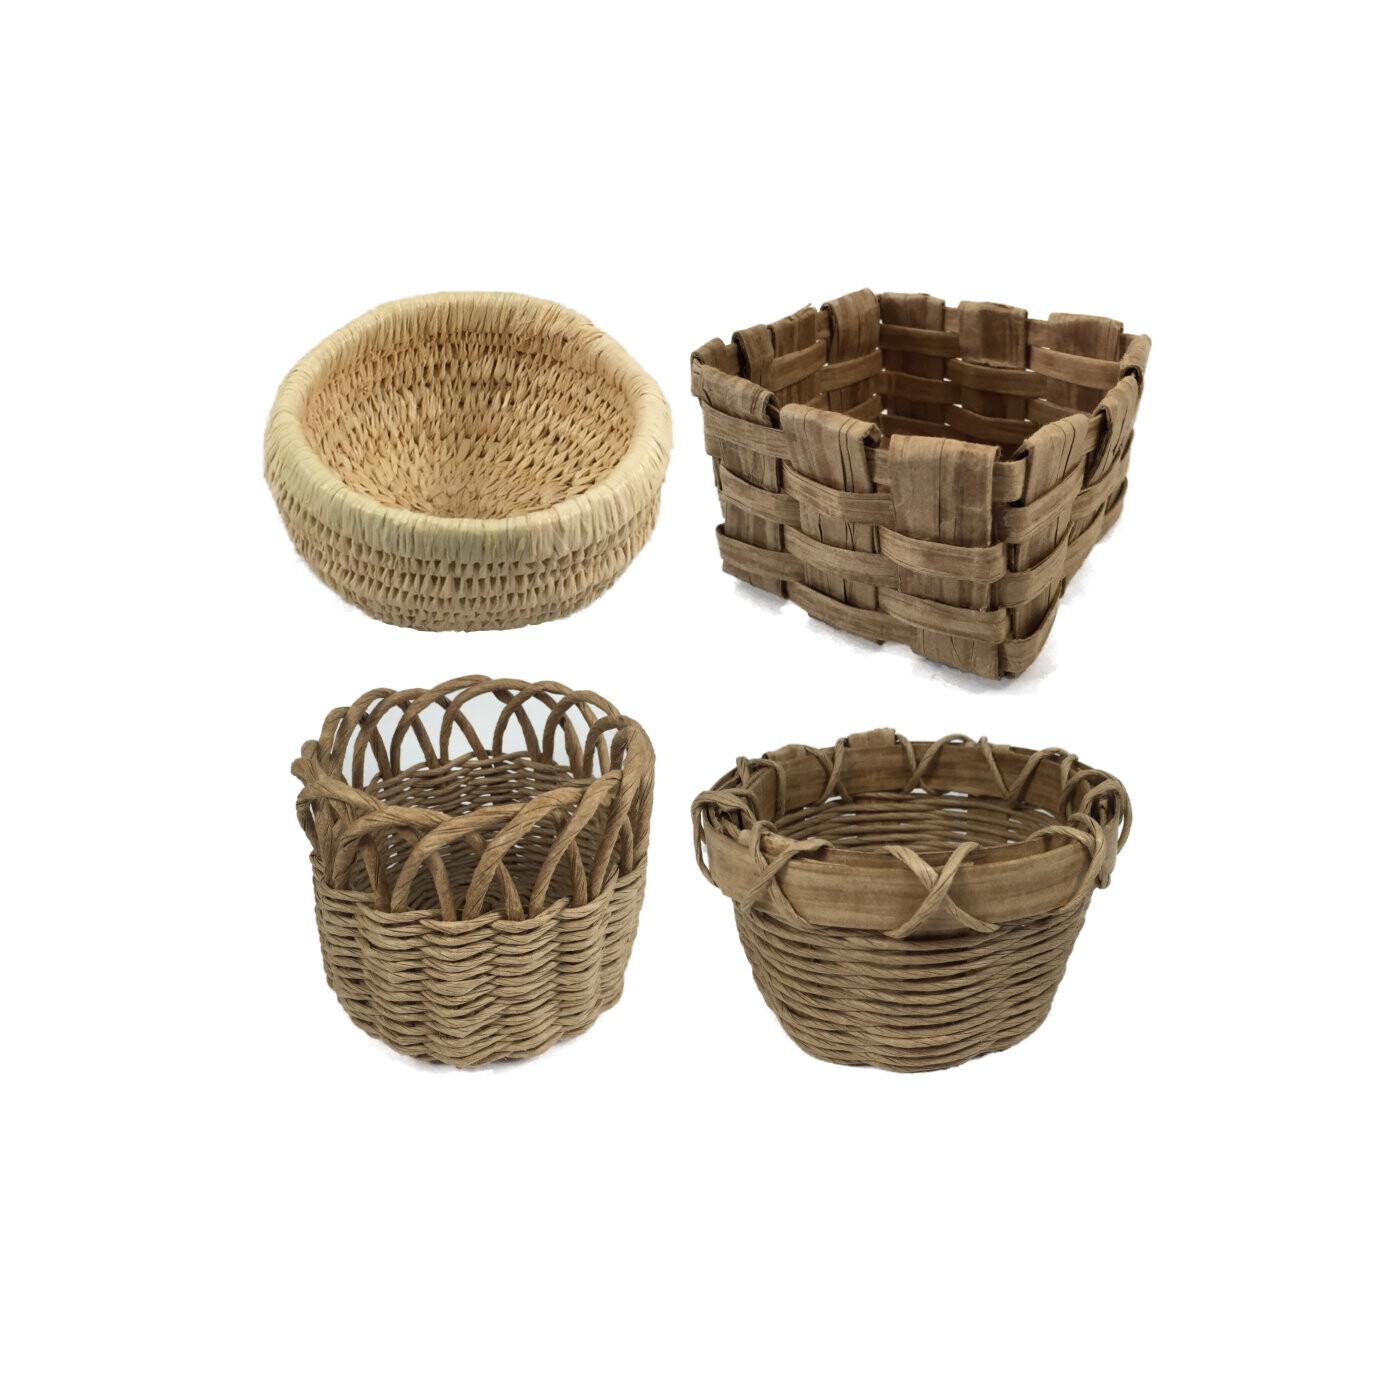 Beginner Basket Kit - Set of Four